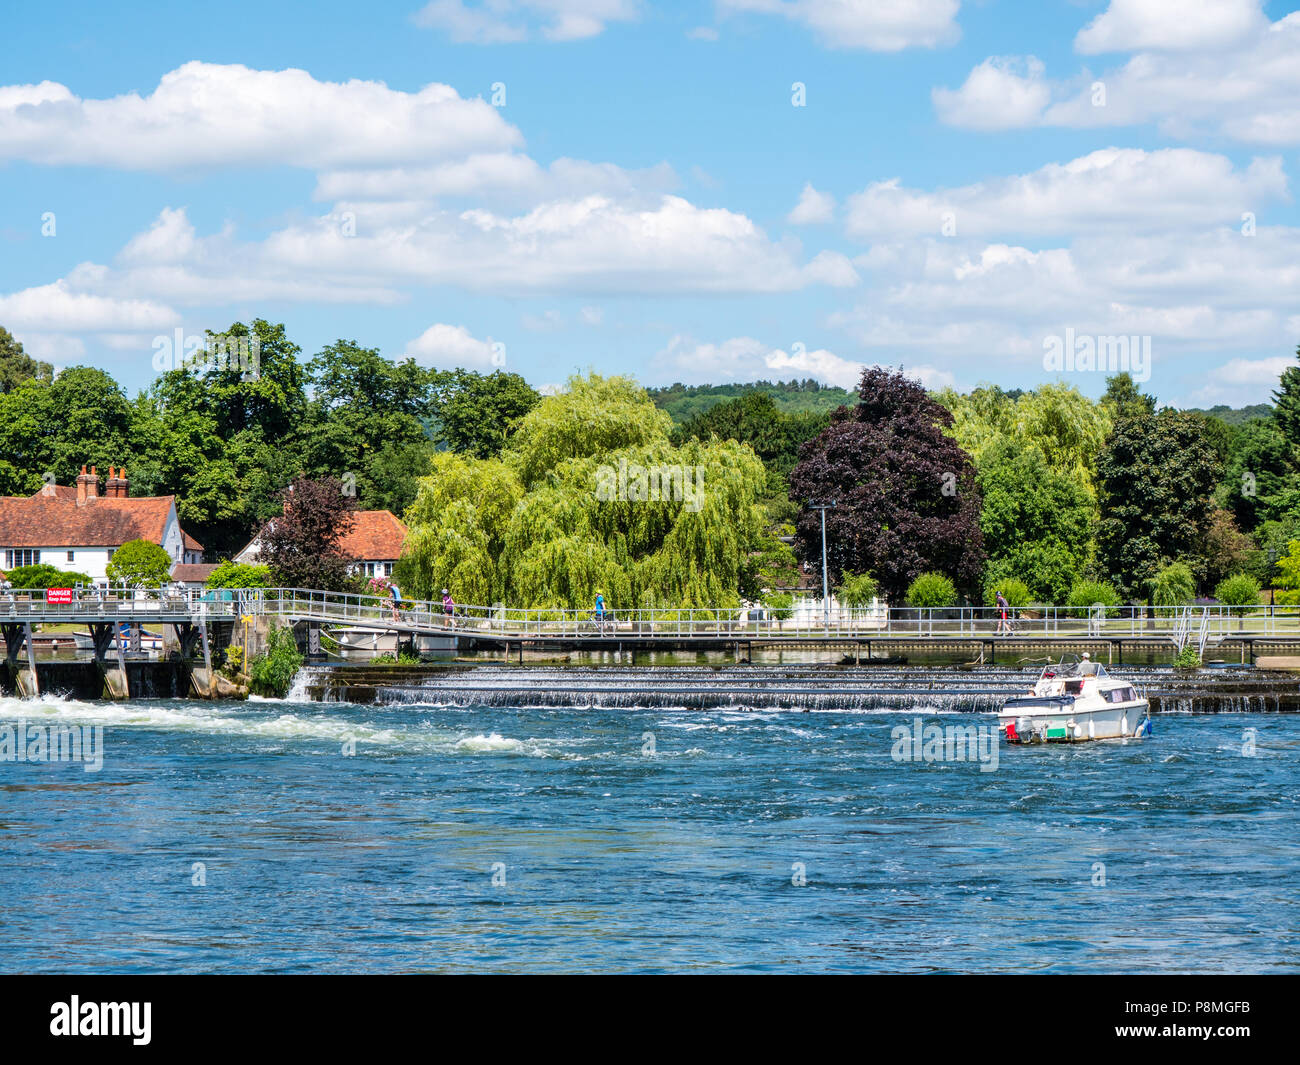 Fishing Boat at Wier, Hambleden Lock and Weir, River Thames, Berkshire, England, UK, GB. - Stock Image